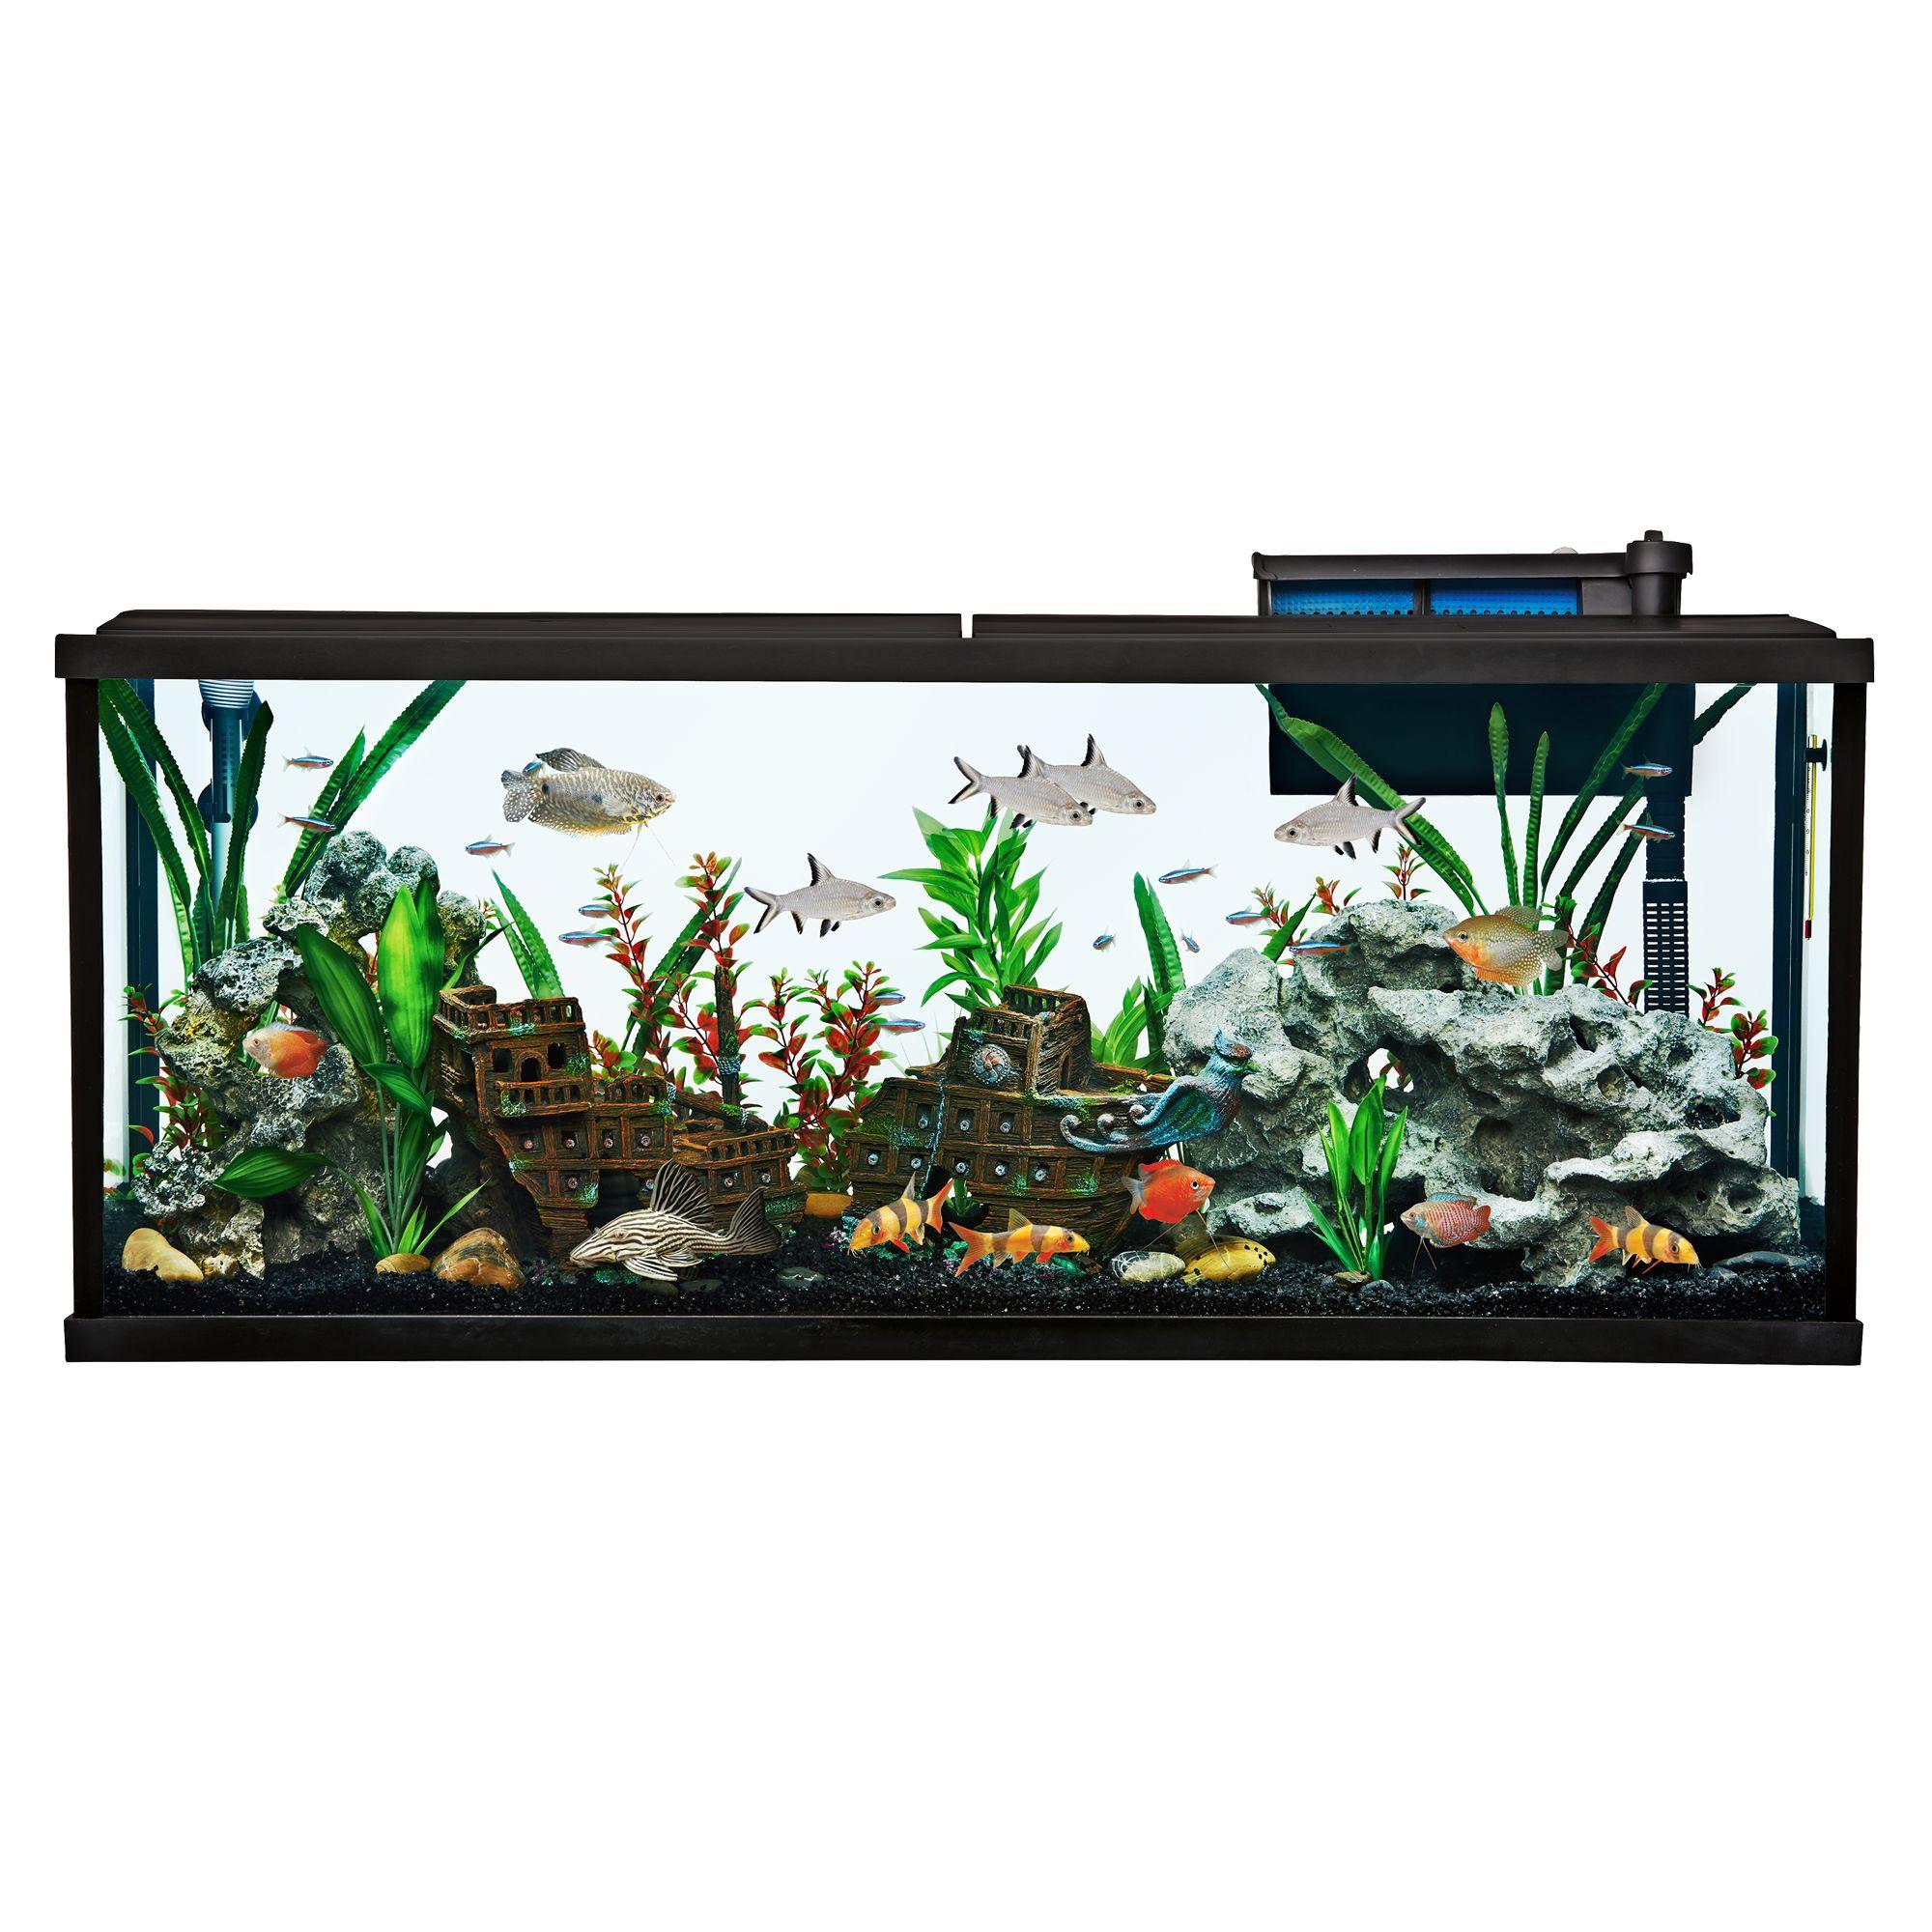 Aquarium top usa for 55 gallon fish tank kit